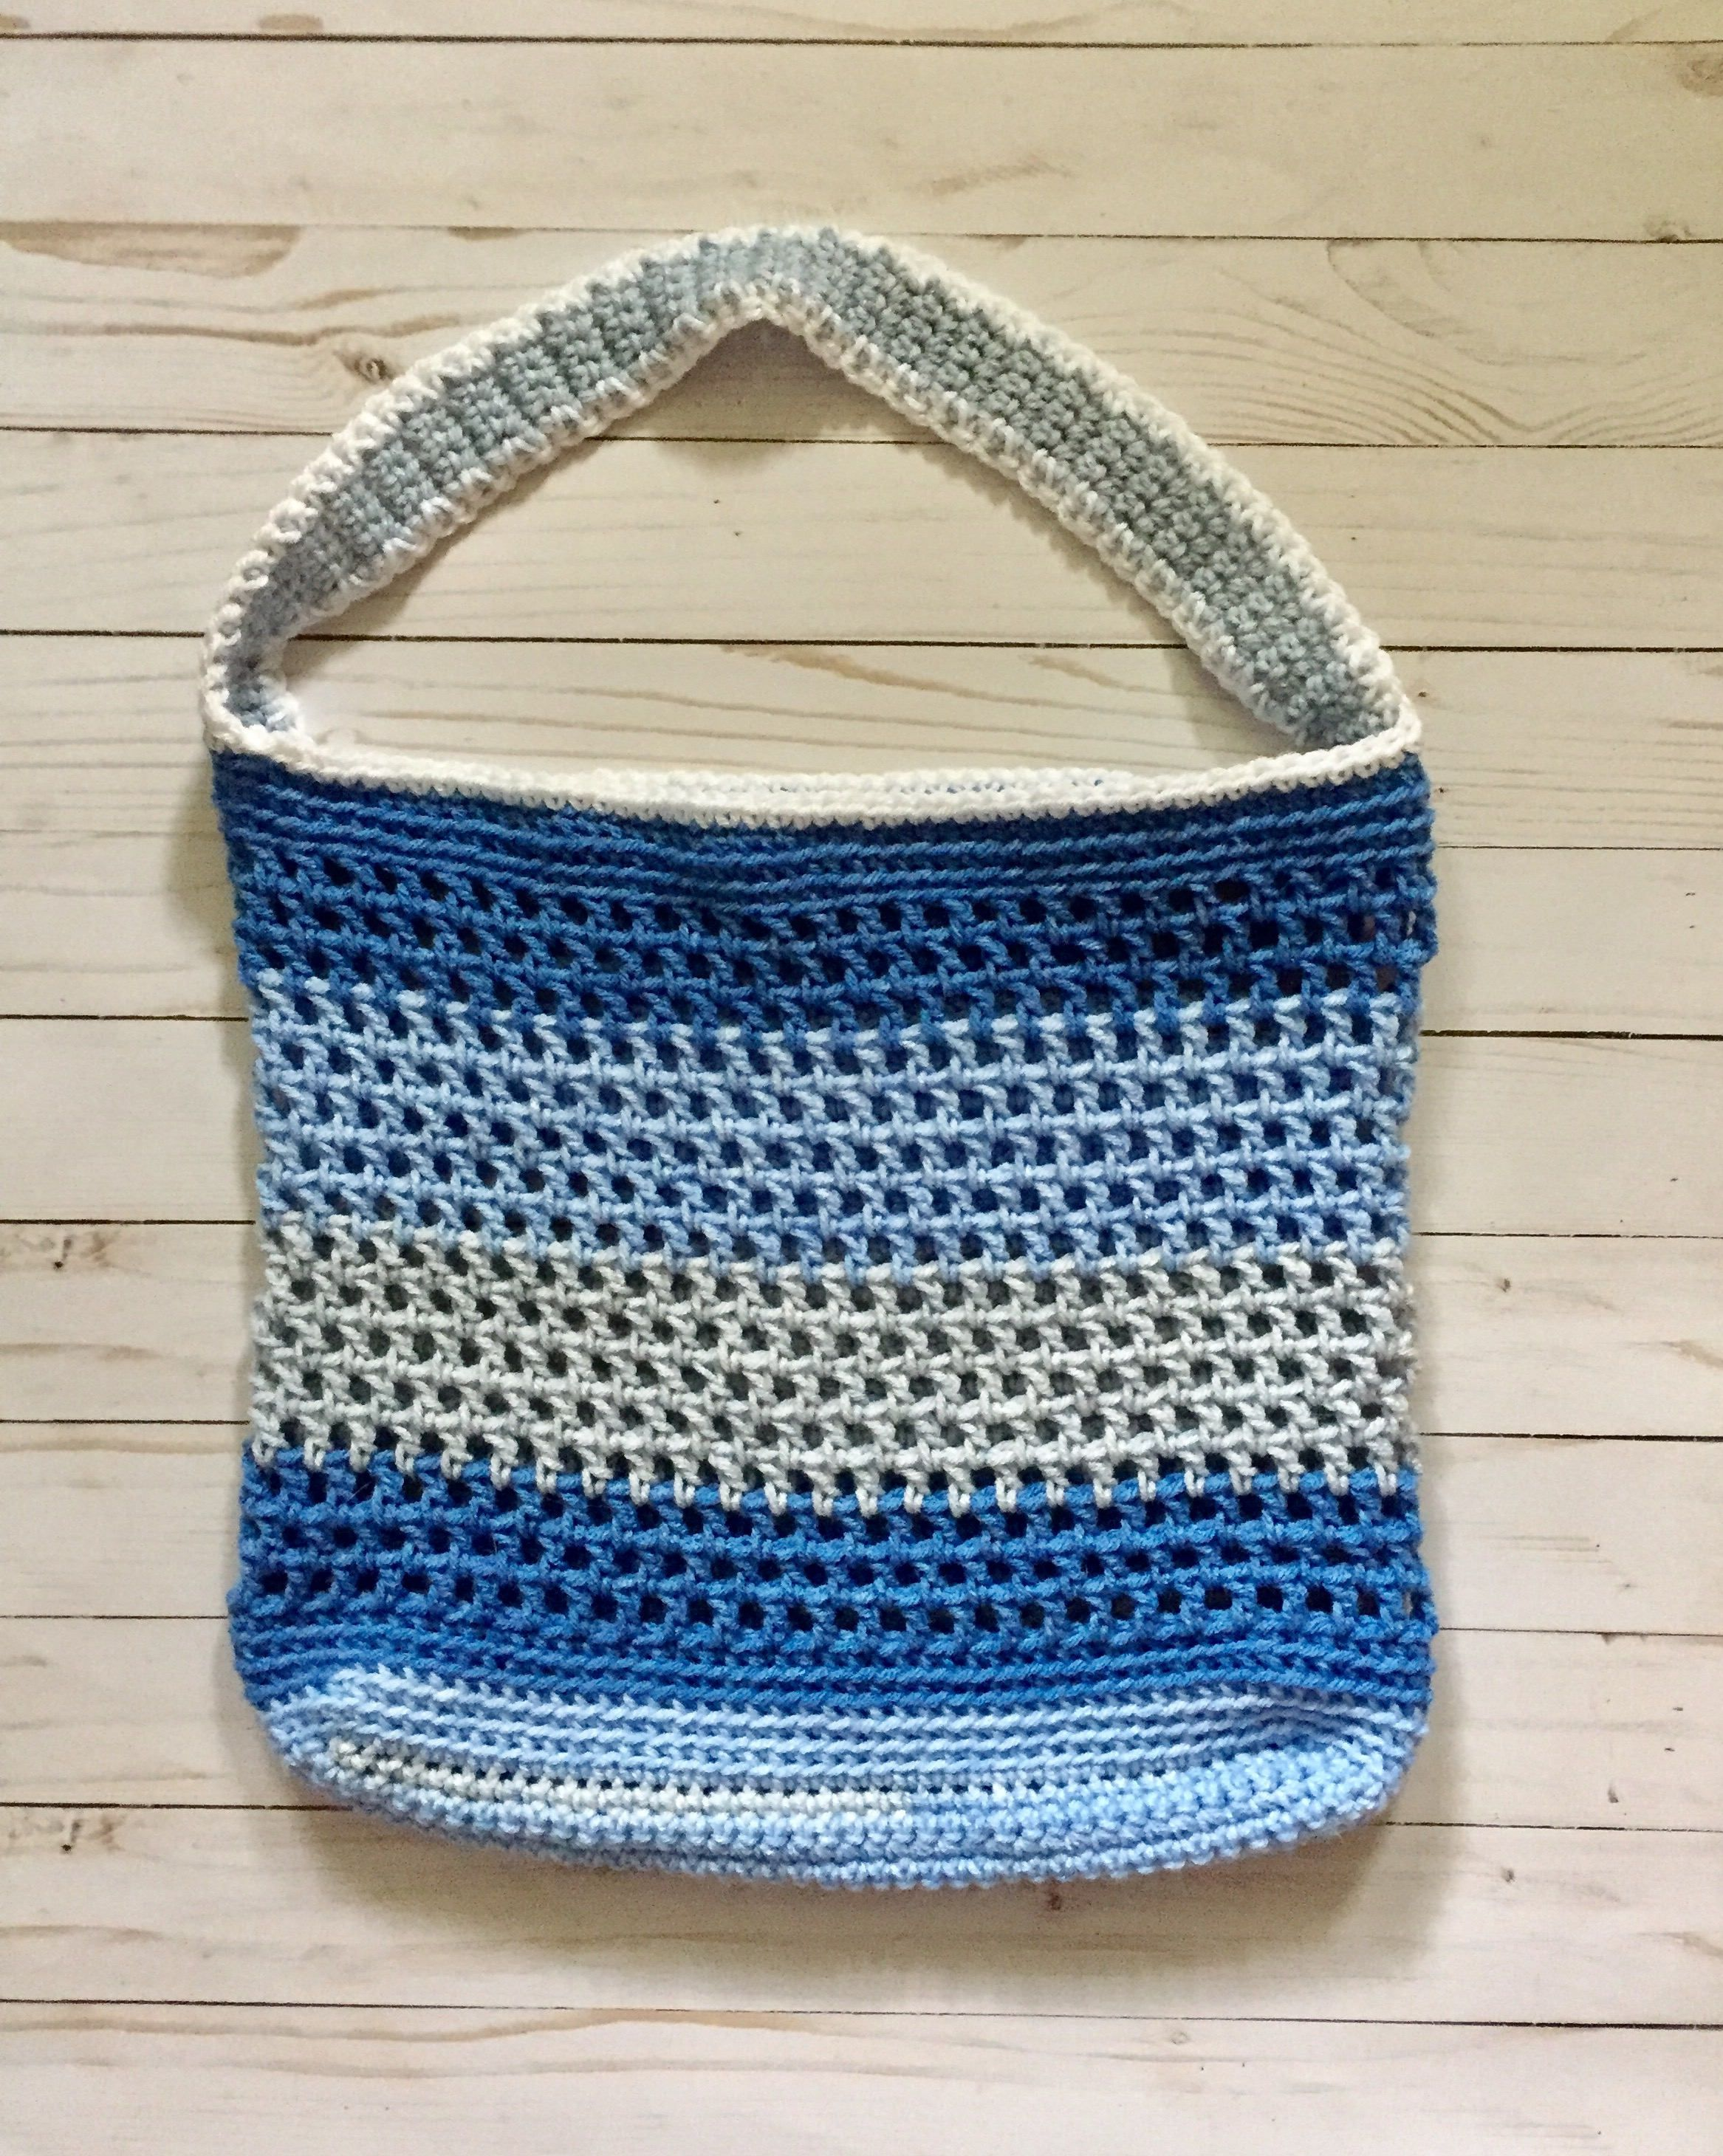 Colorblock Tote Bag, crochet tote bag, crochet market bag, crochet beach bag, crochet tote, crochet purse, crochet bag by StitchesBySullivan on Etsy